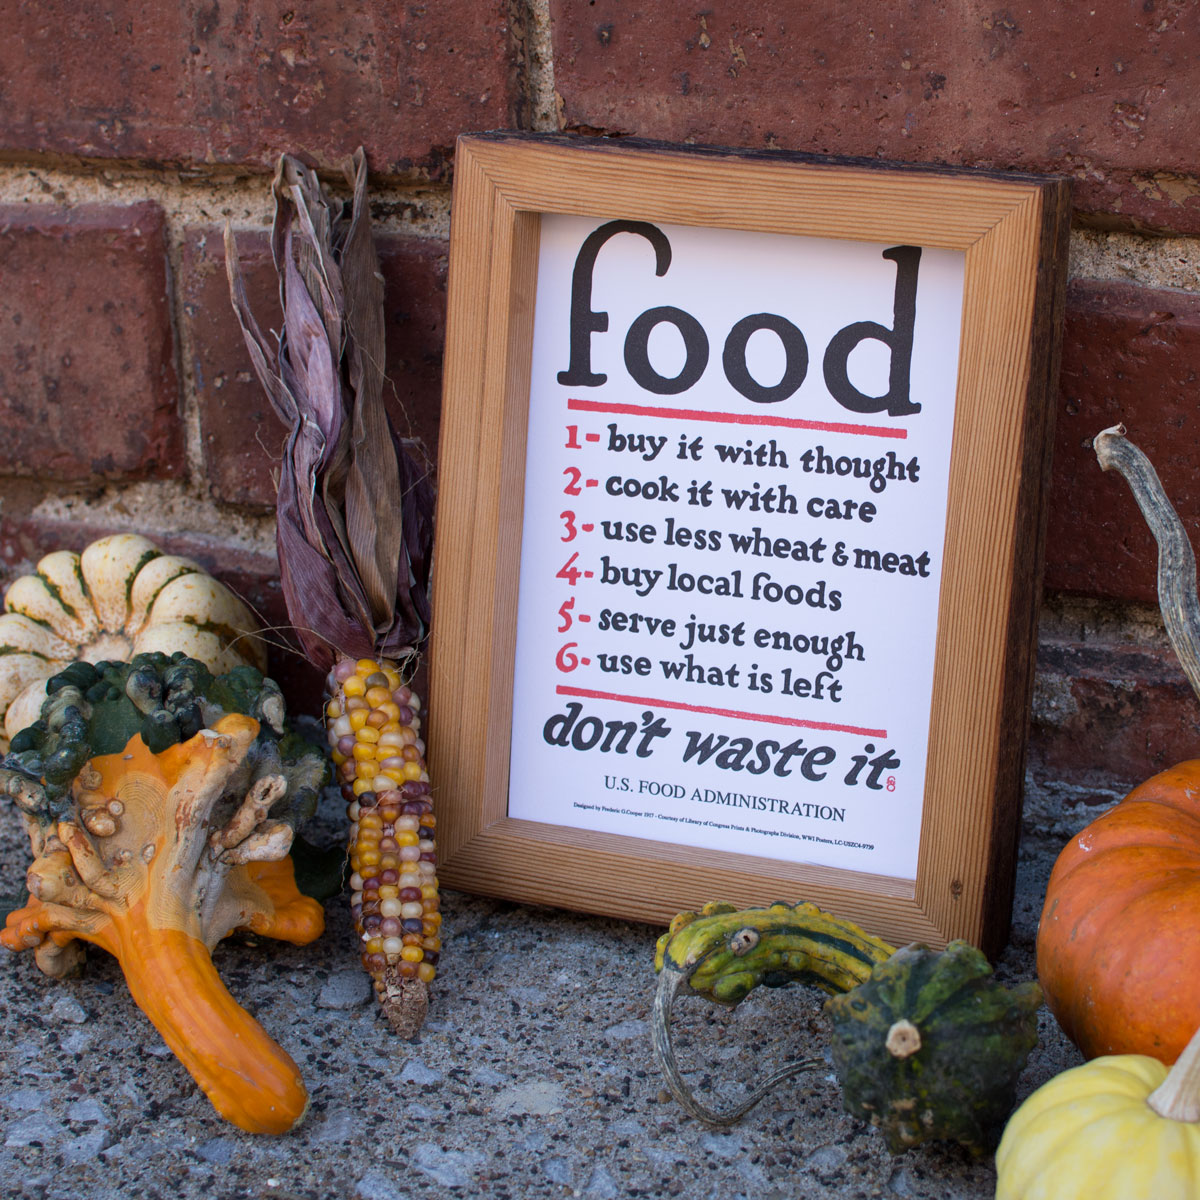 sm-food-rules-brick-gords-square-1200px.jpg